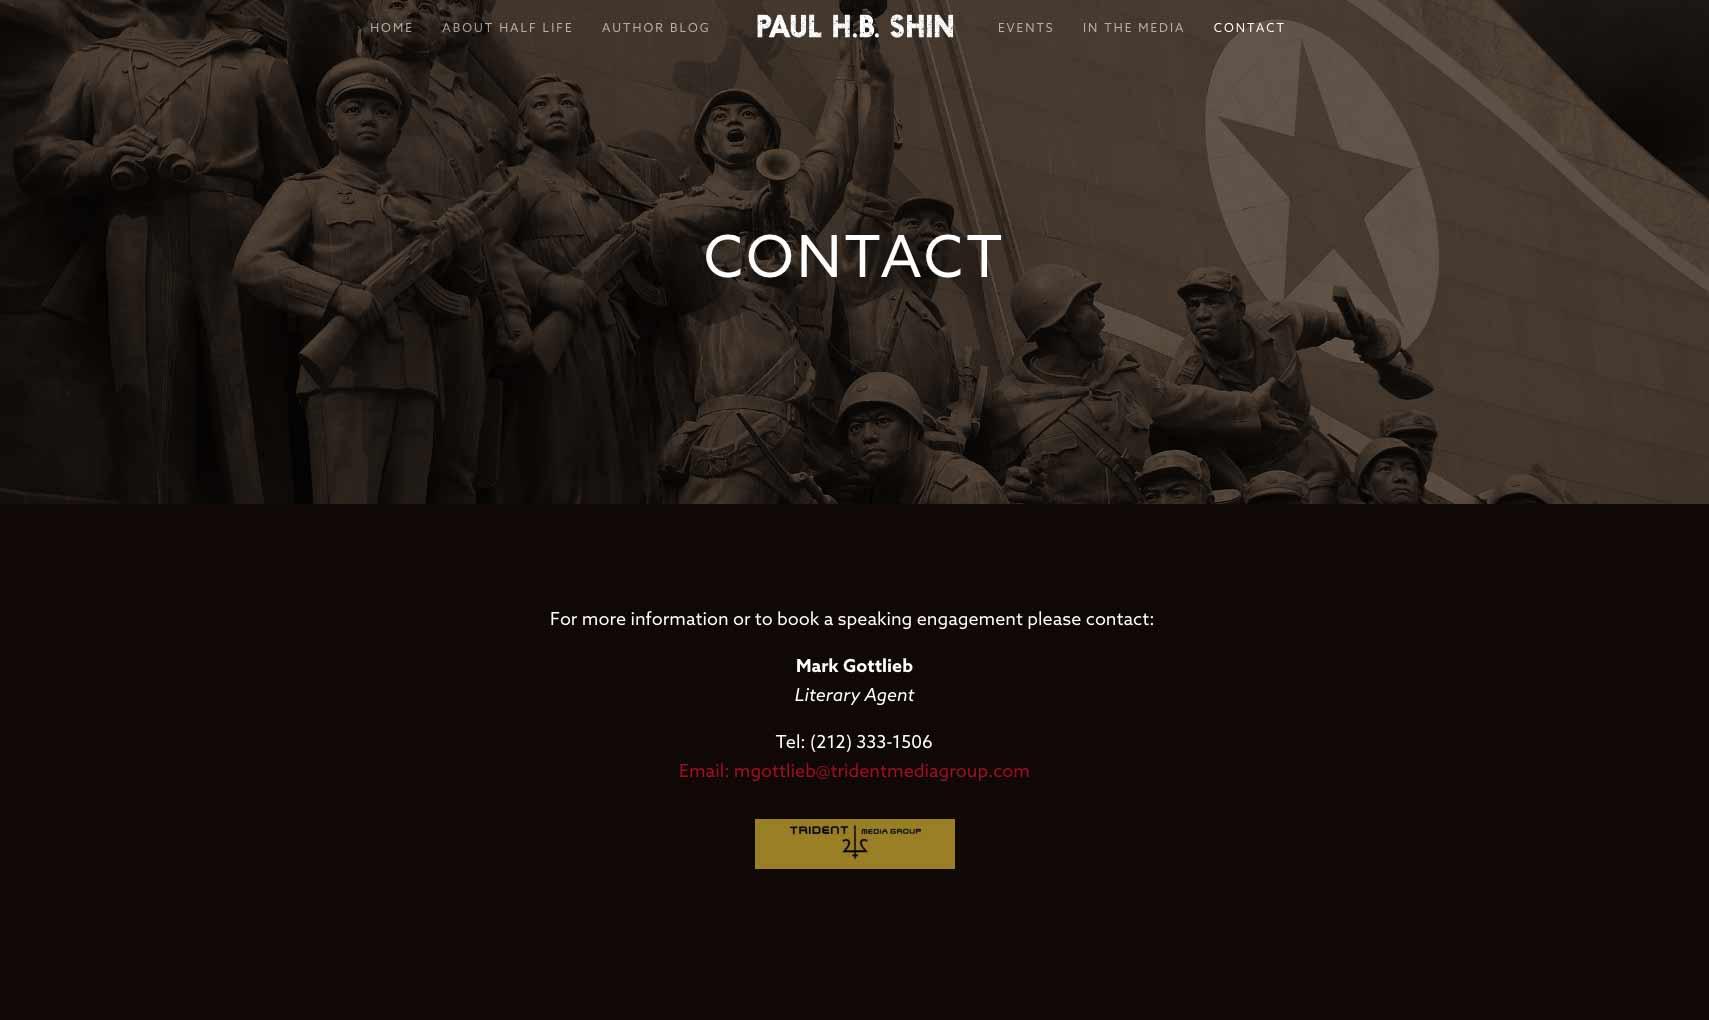 Half Life Contact Page